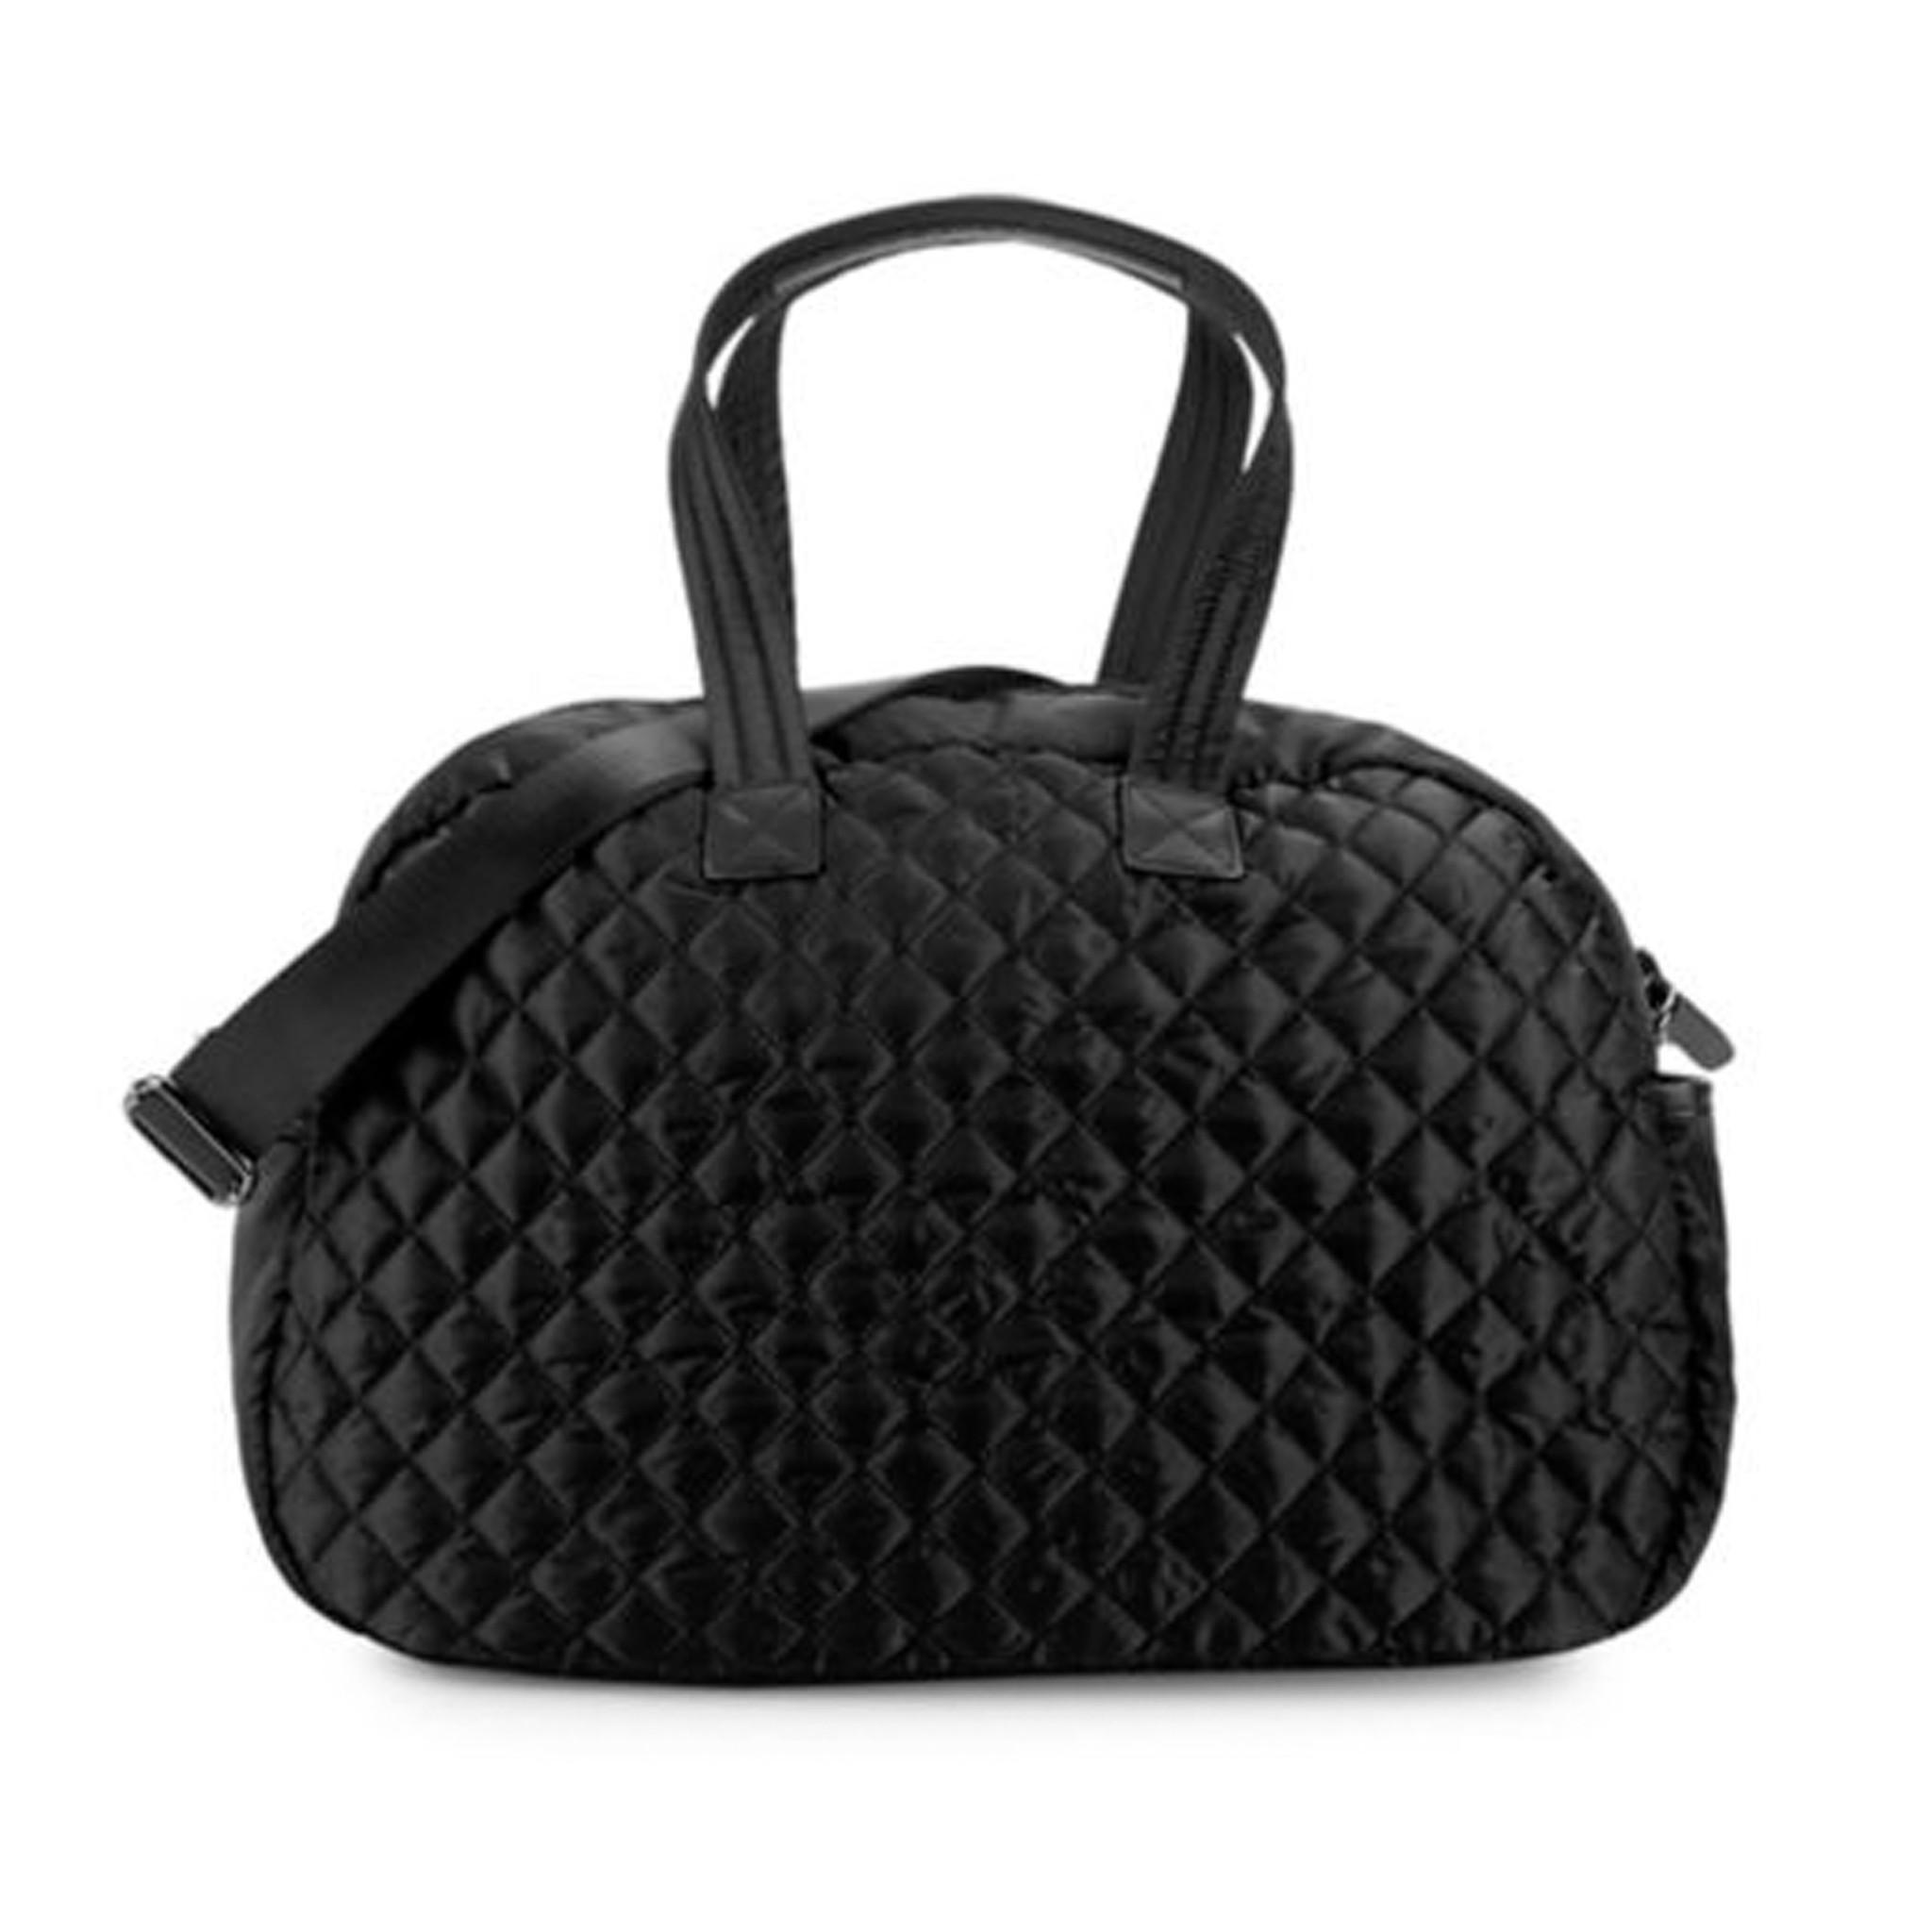 Sol & Selene Getaway Quilted Bag